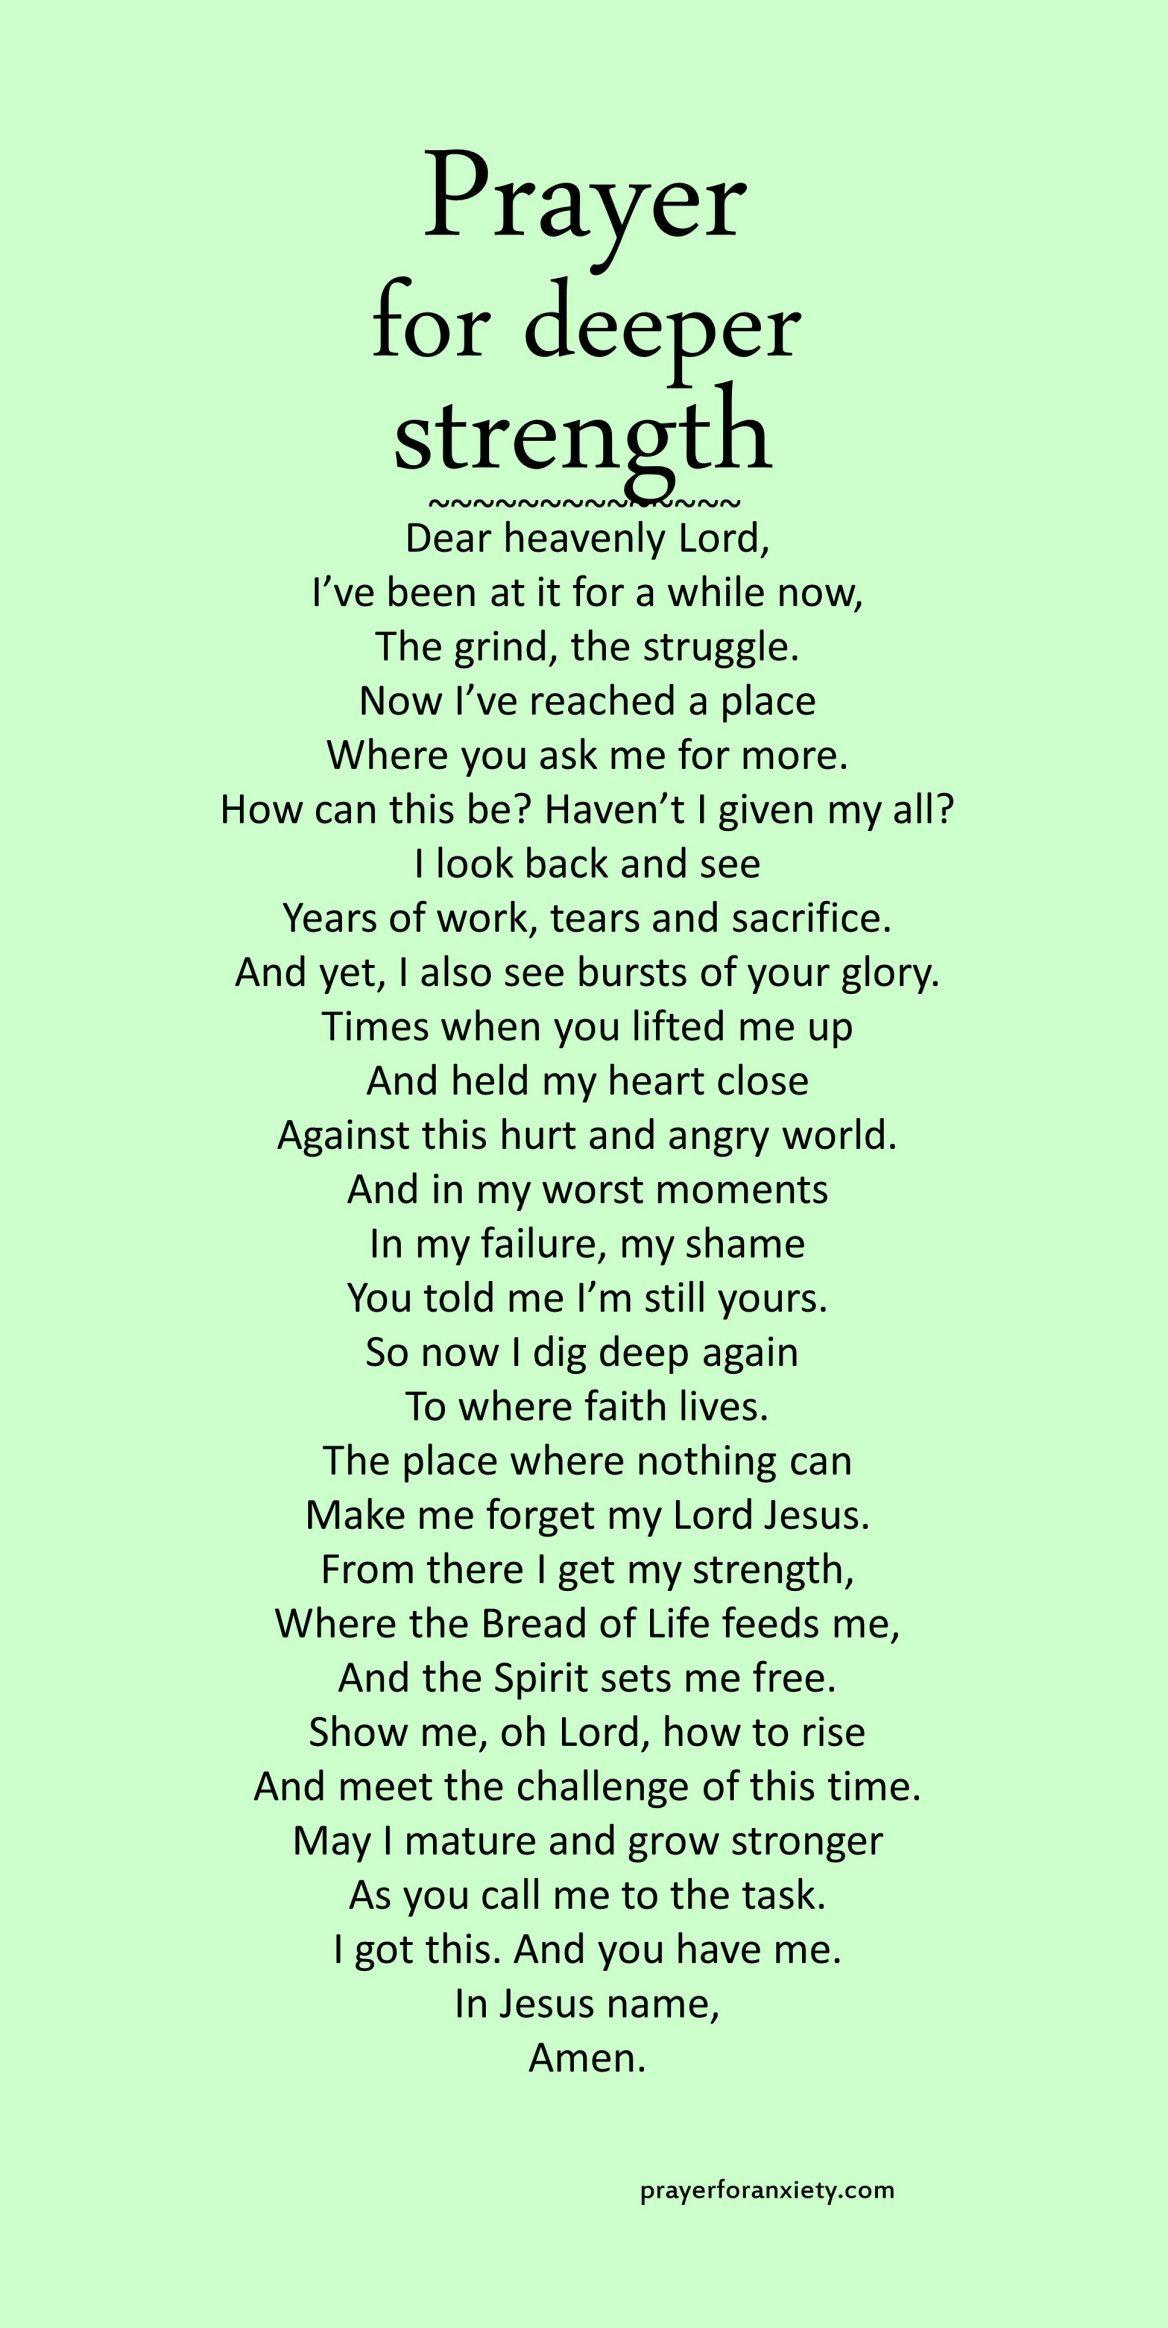 Prayer for deeper strength